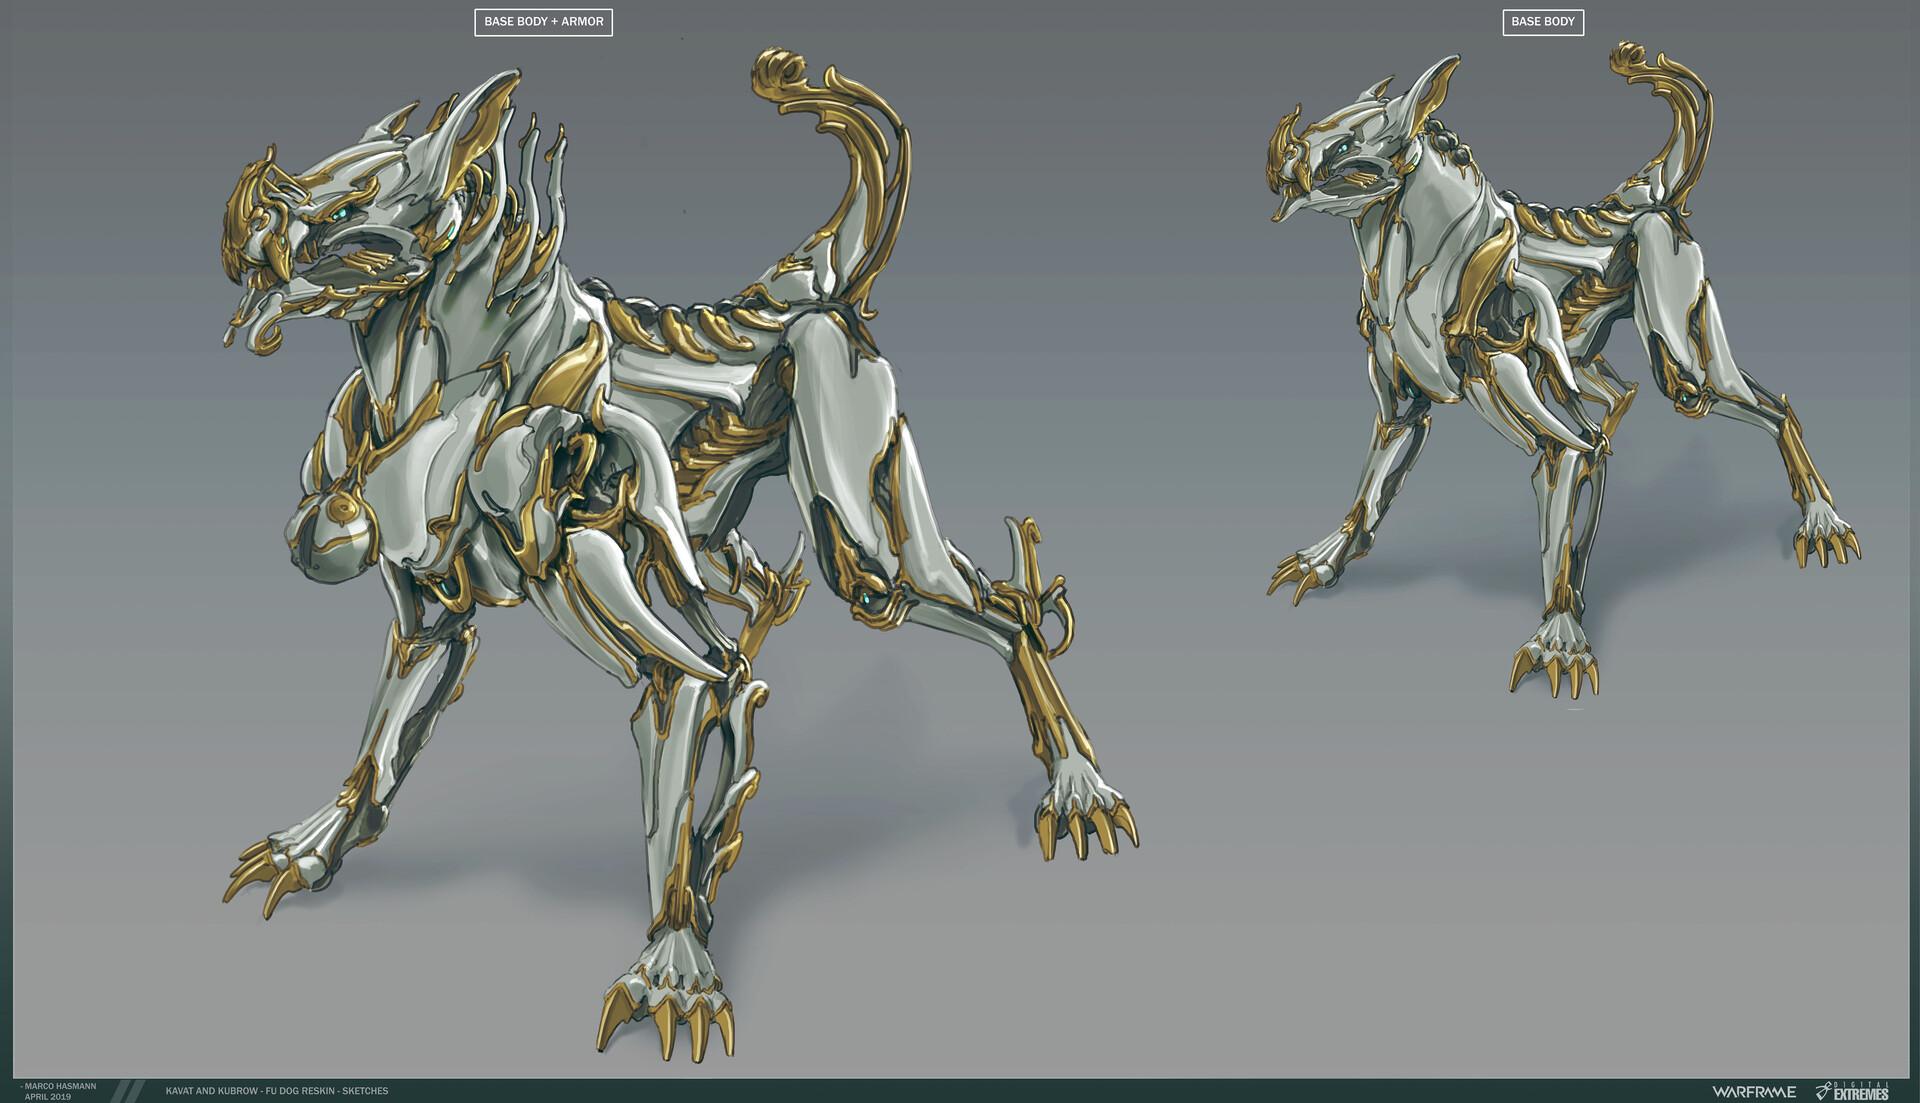 Marco hasmann mh kubrow fu dog skin sketch3